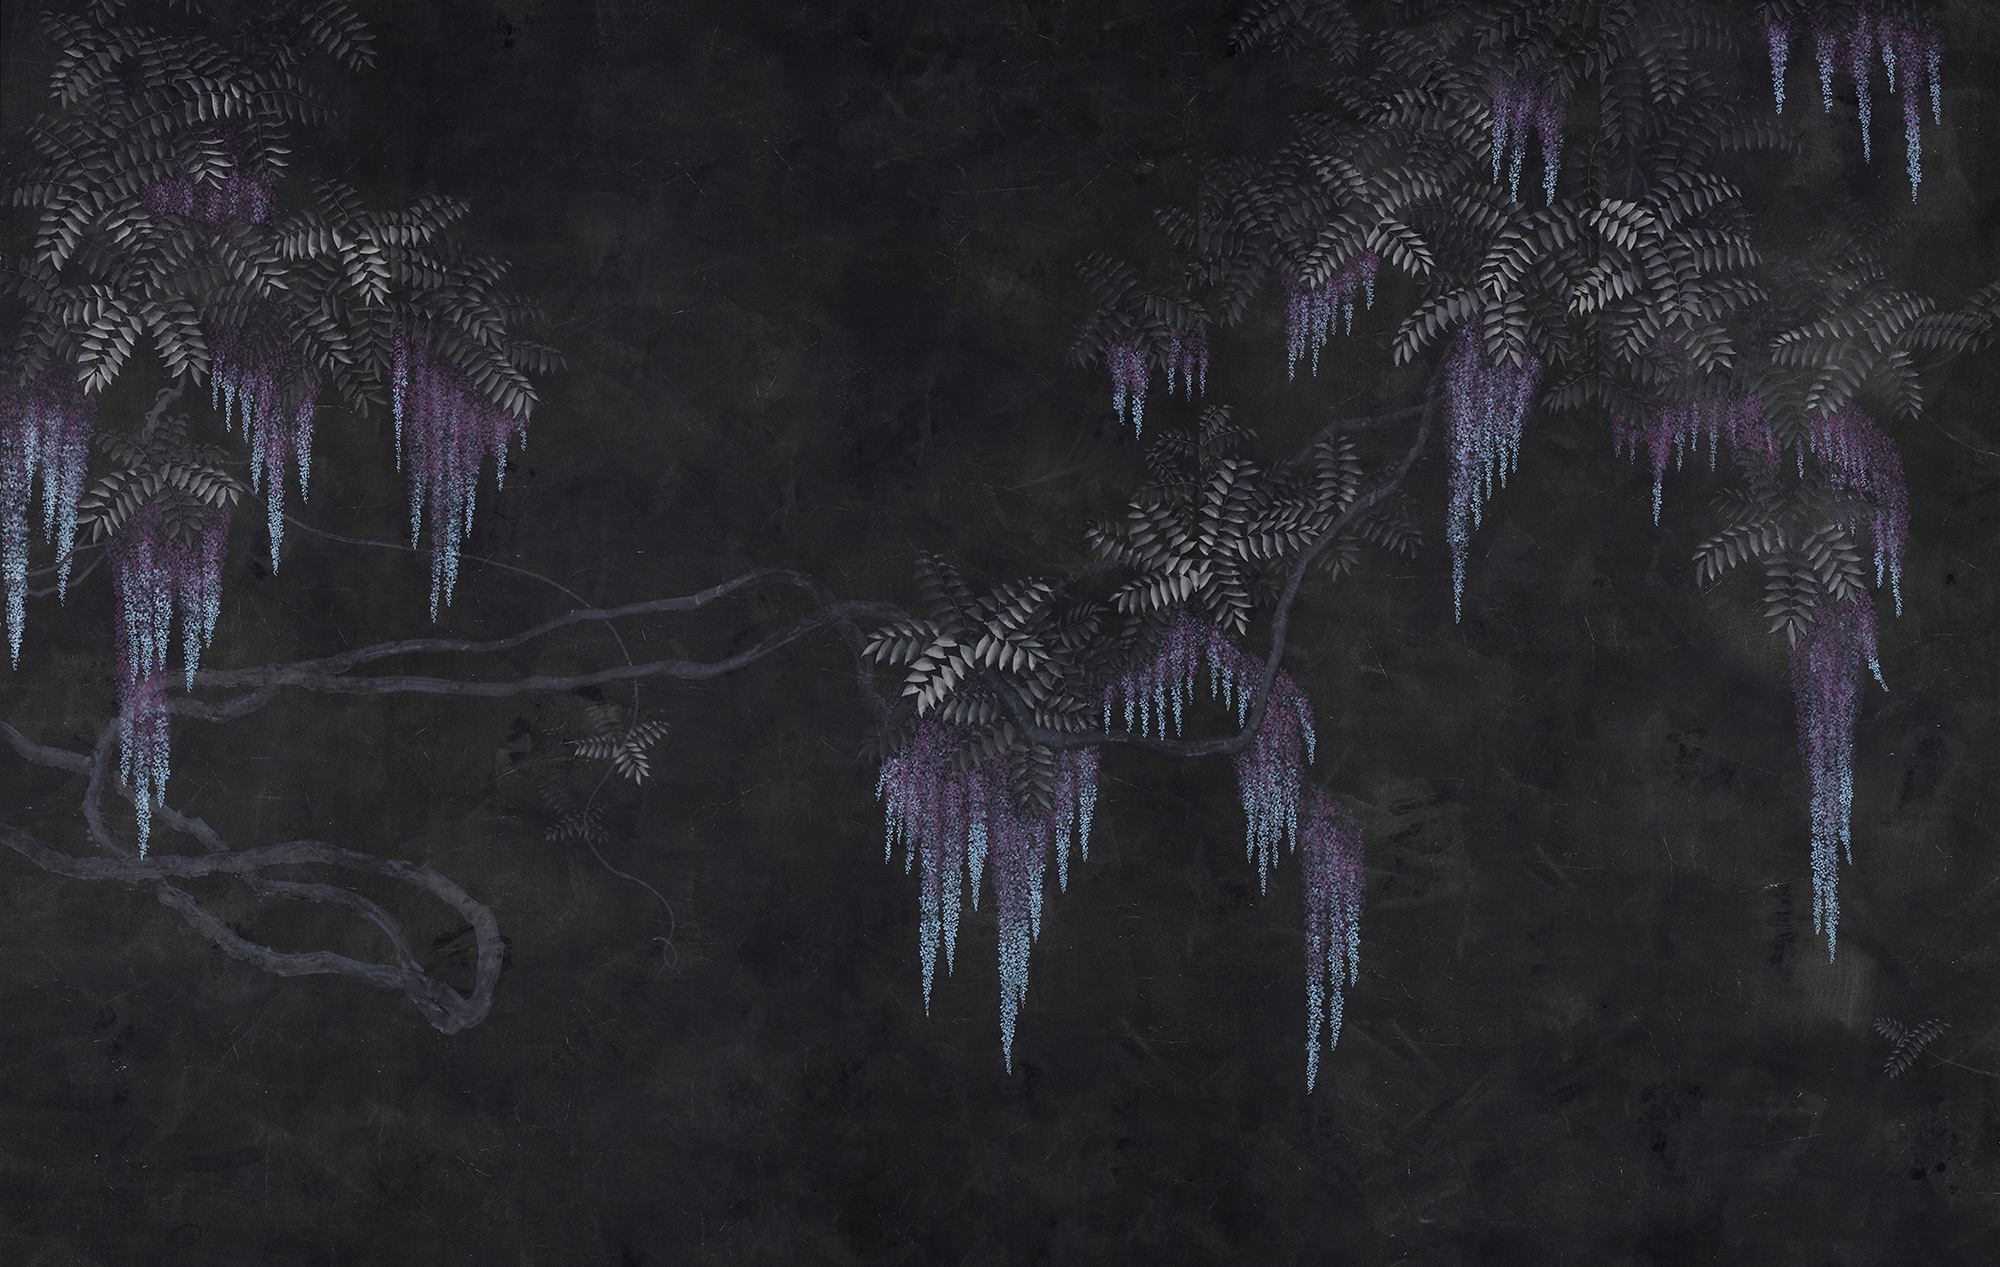 Original on Edo Night painted Xuan paper